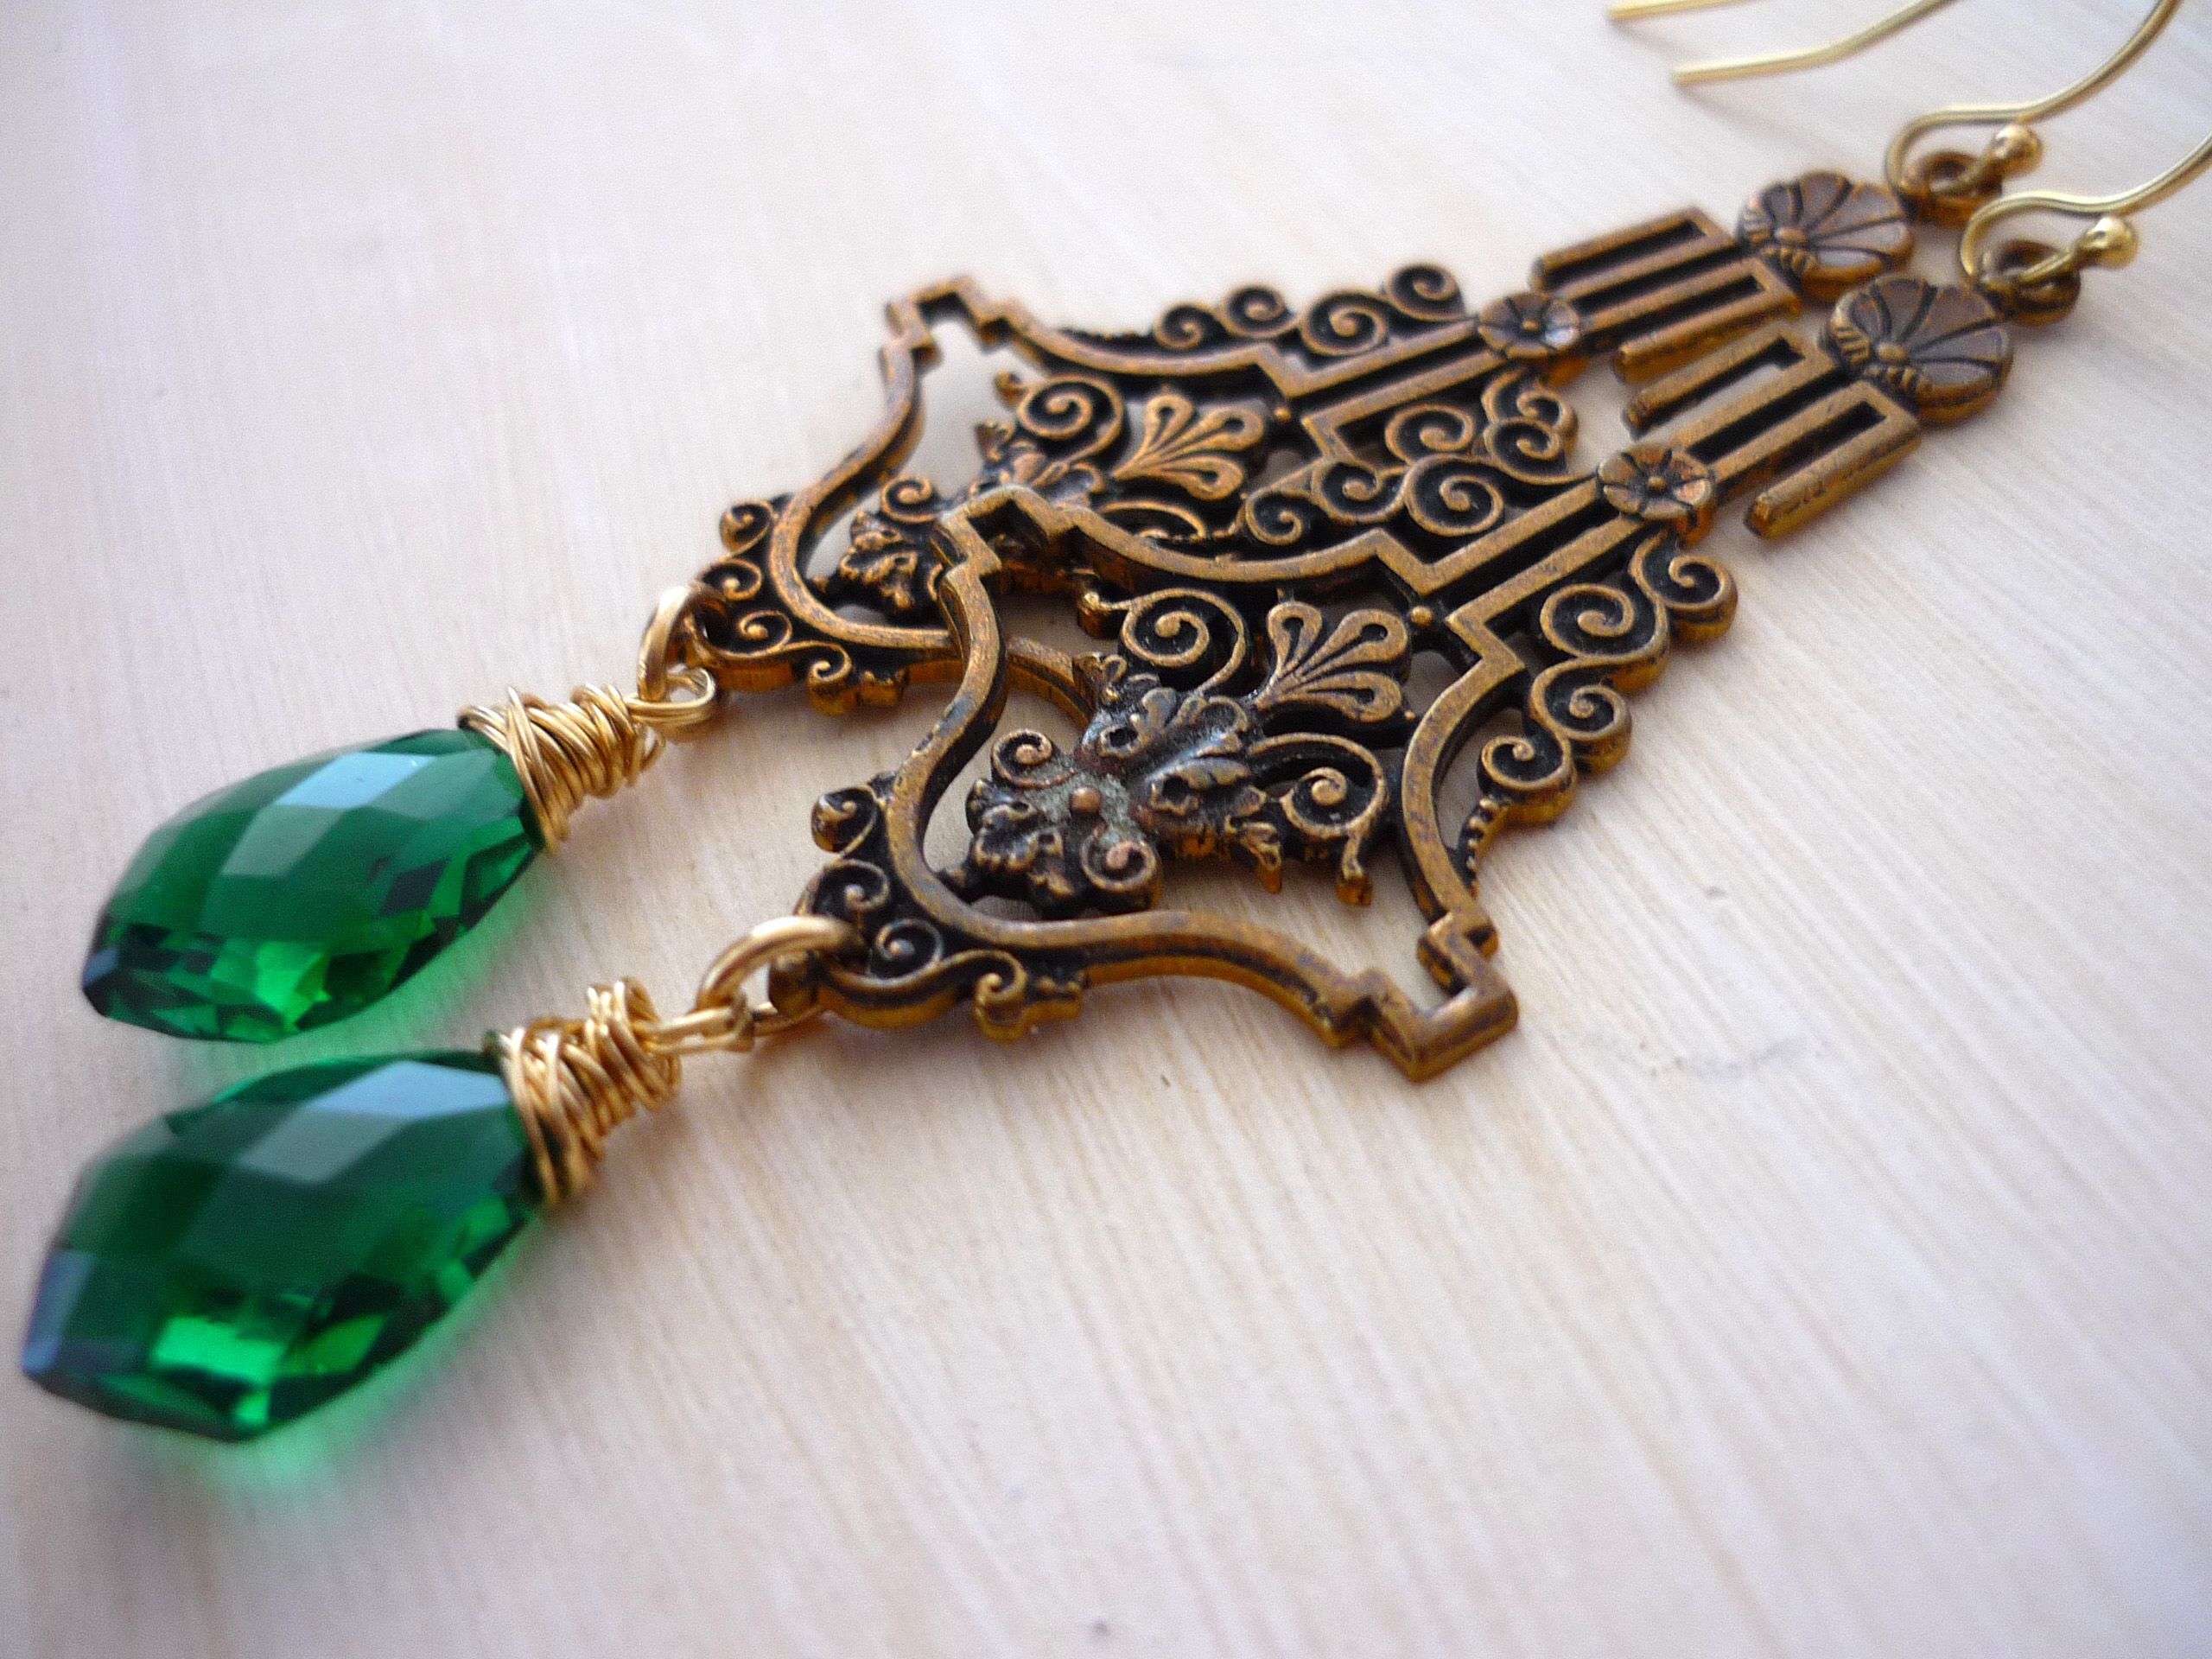 lush Baubles Kylie Marie Antique art nouveau brass filigrees, green rock crystal quartz, 14kt gold filled wires $129.00